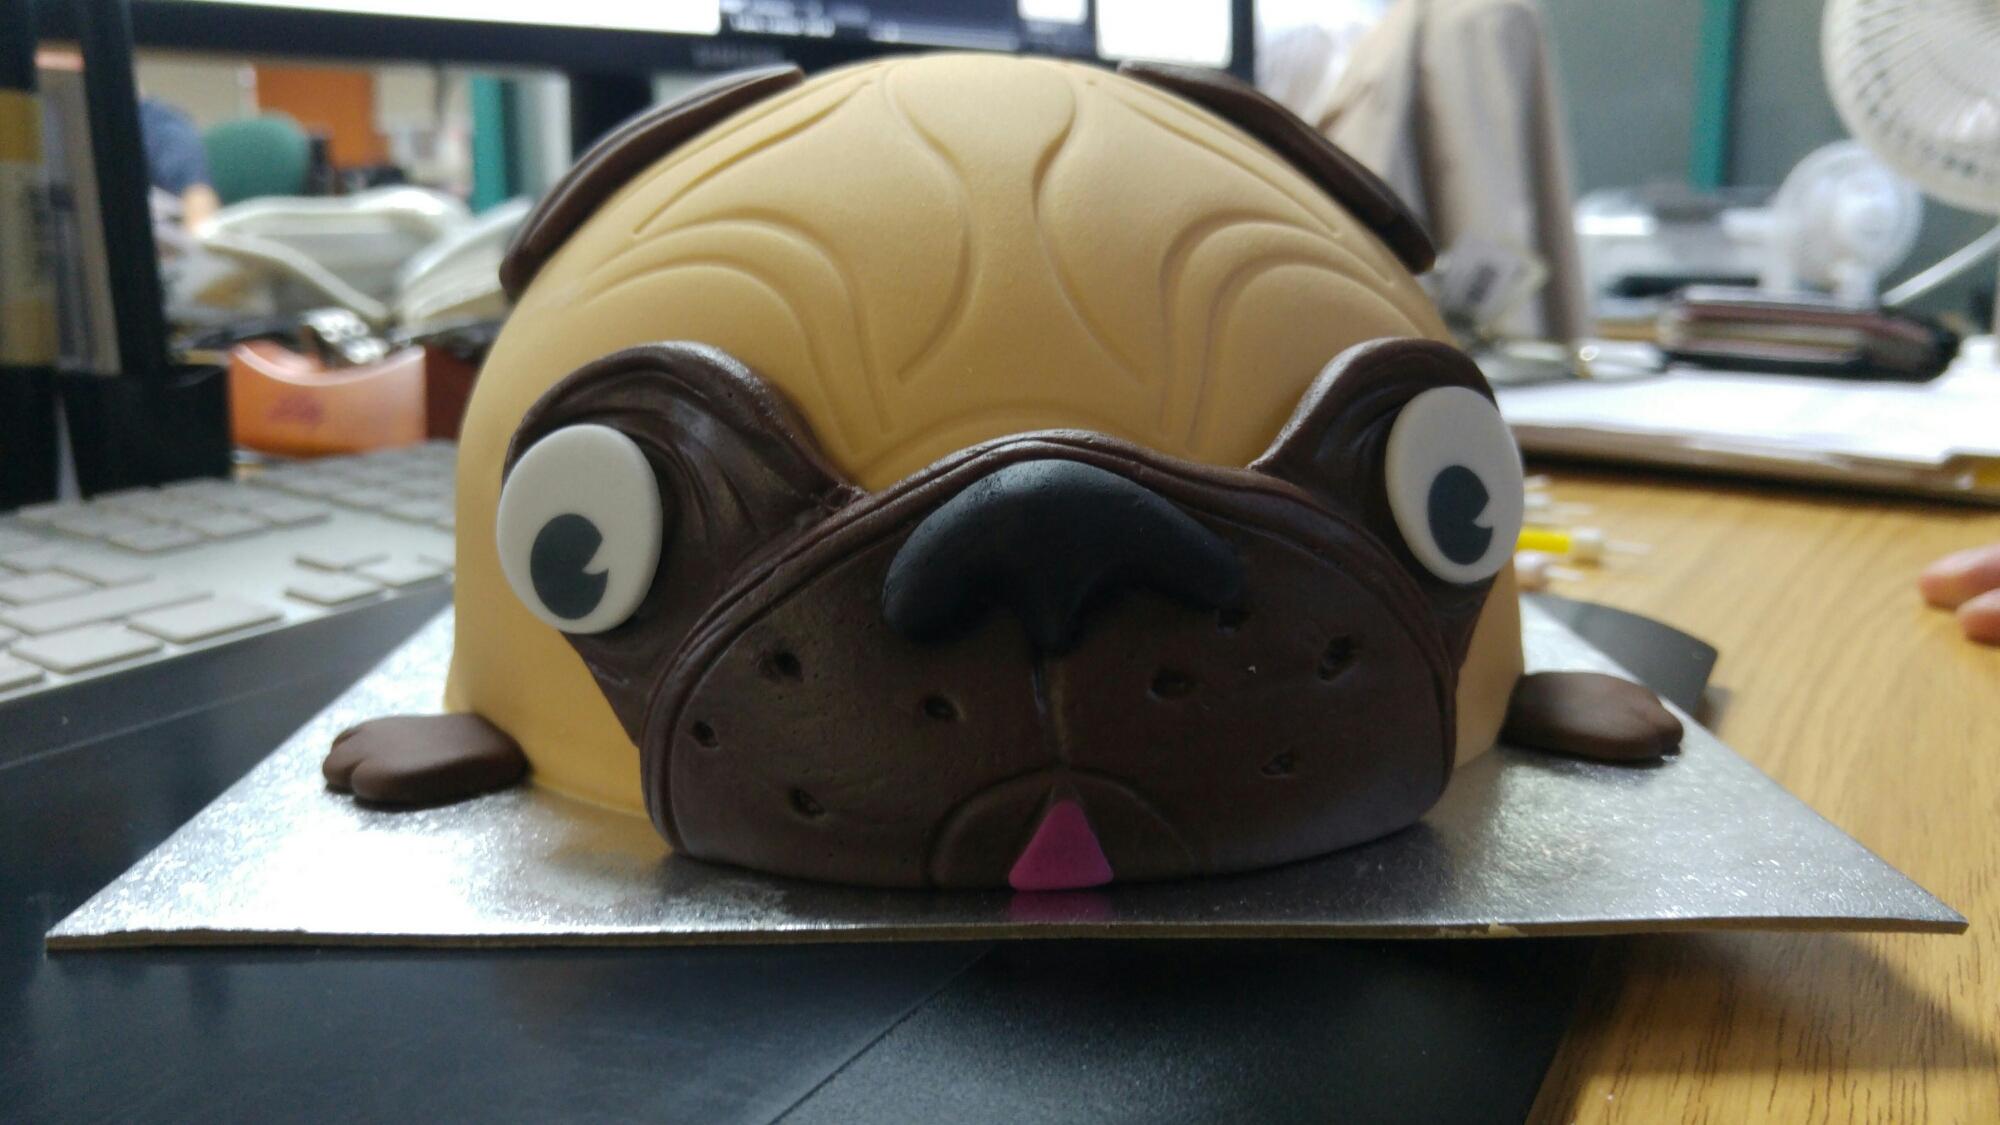 Remarkable 04 11 15 Pug Birthday Cake Steph Jones Daily Blog Funny Birthday Cards Online Bapapcheapnameinfo